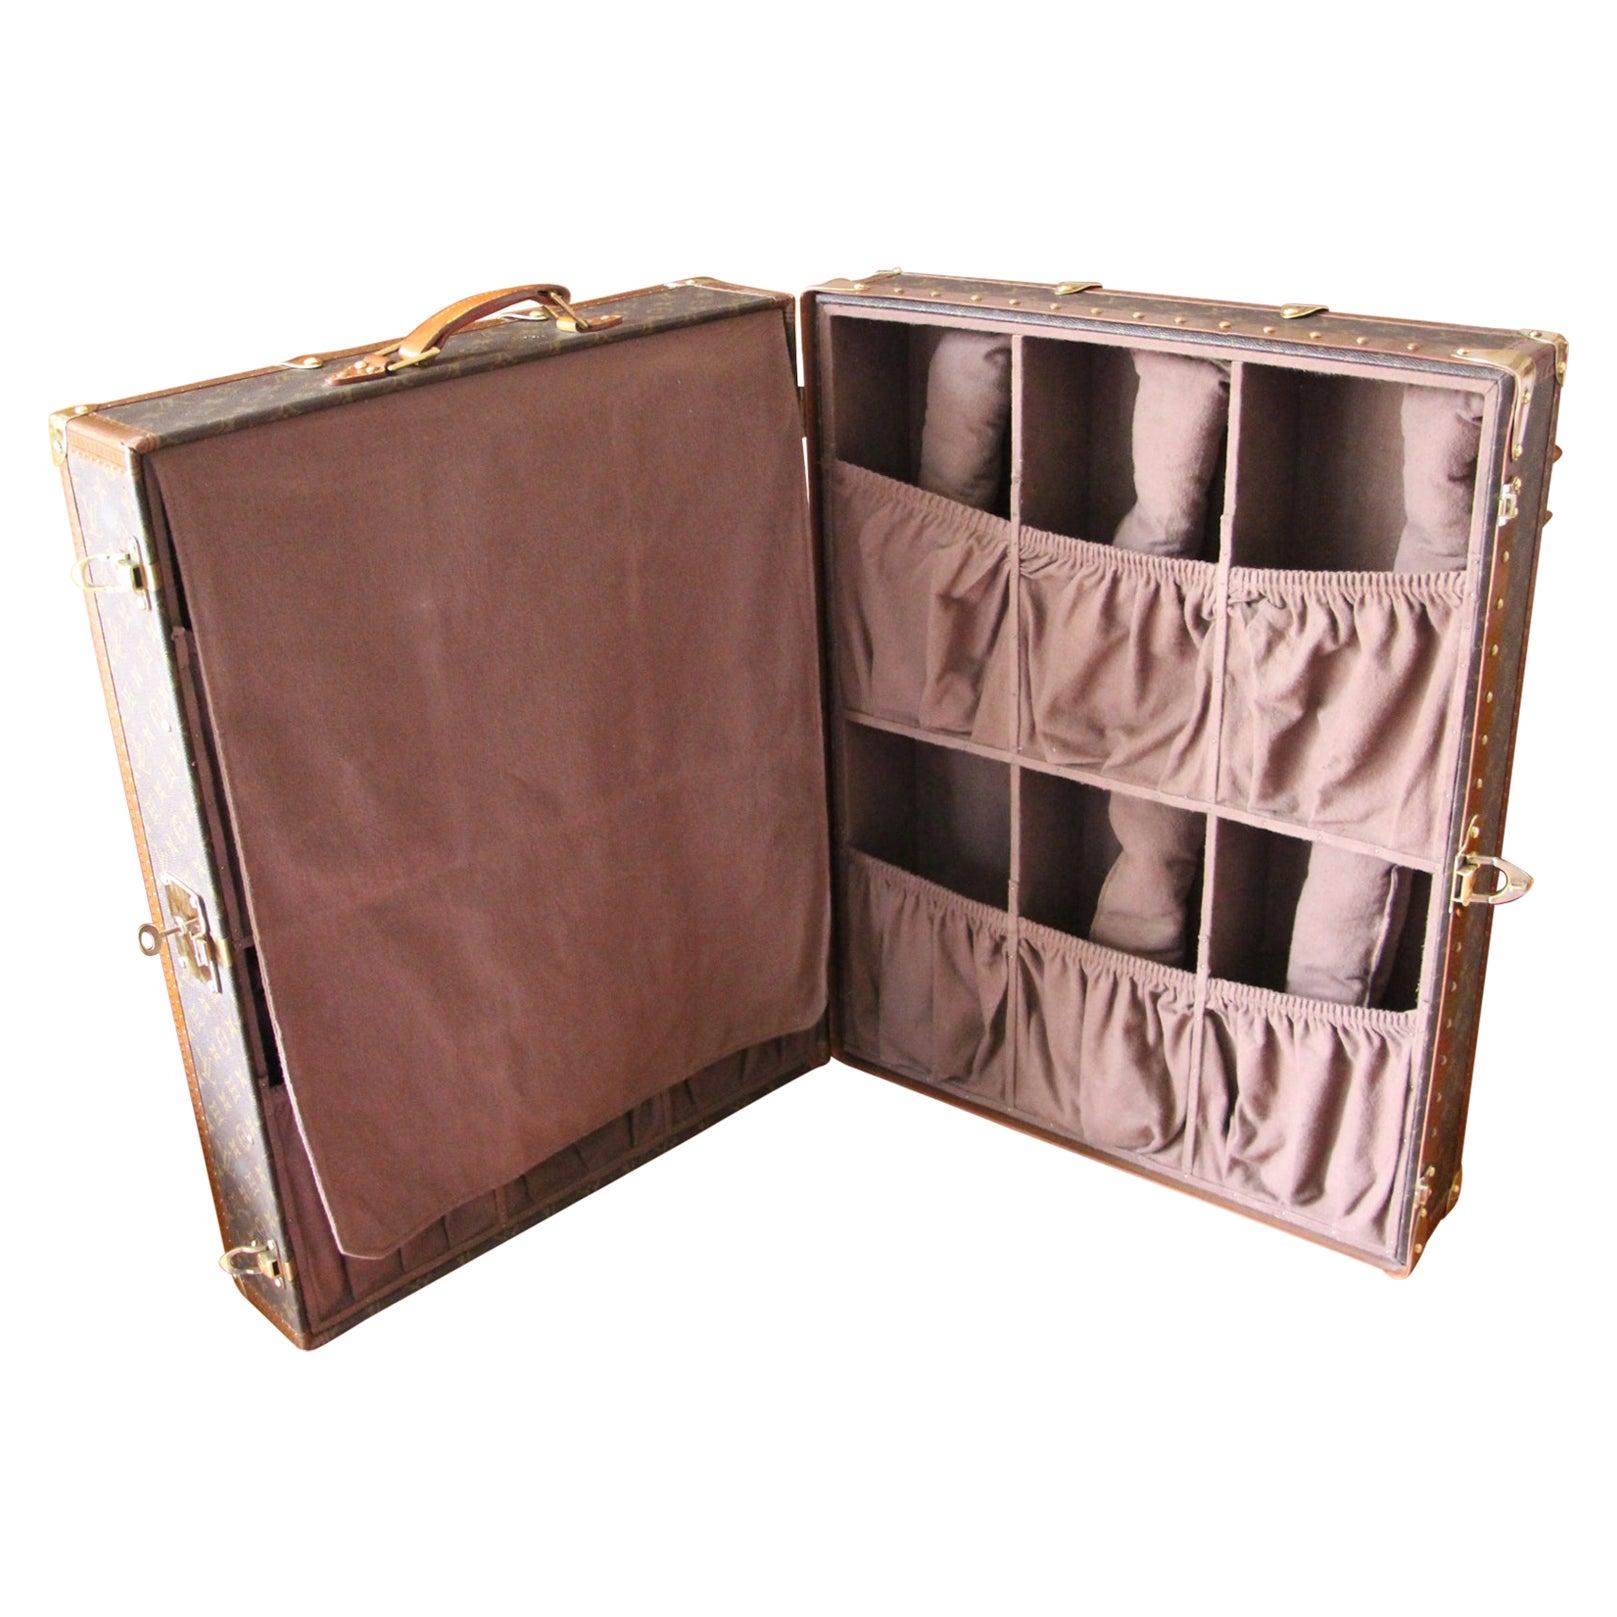 Louis Vuitton Monogramm Shoe Trunk, Louis Vuitton Shoe Case, Louis Vuitton Trunk